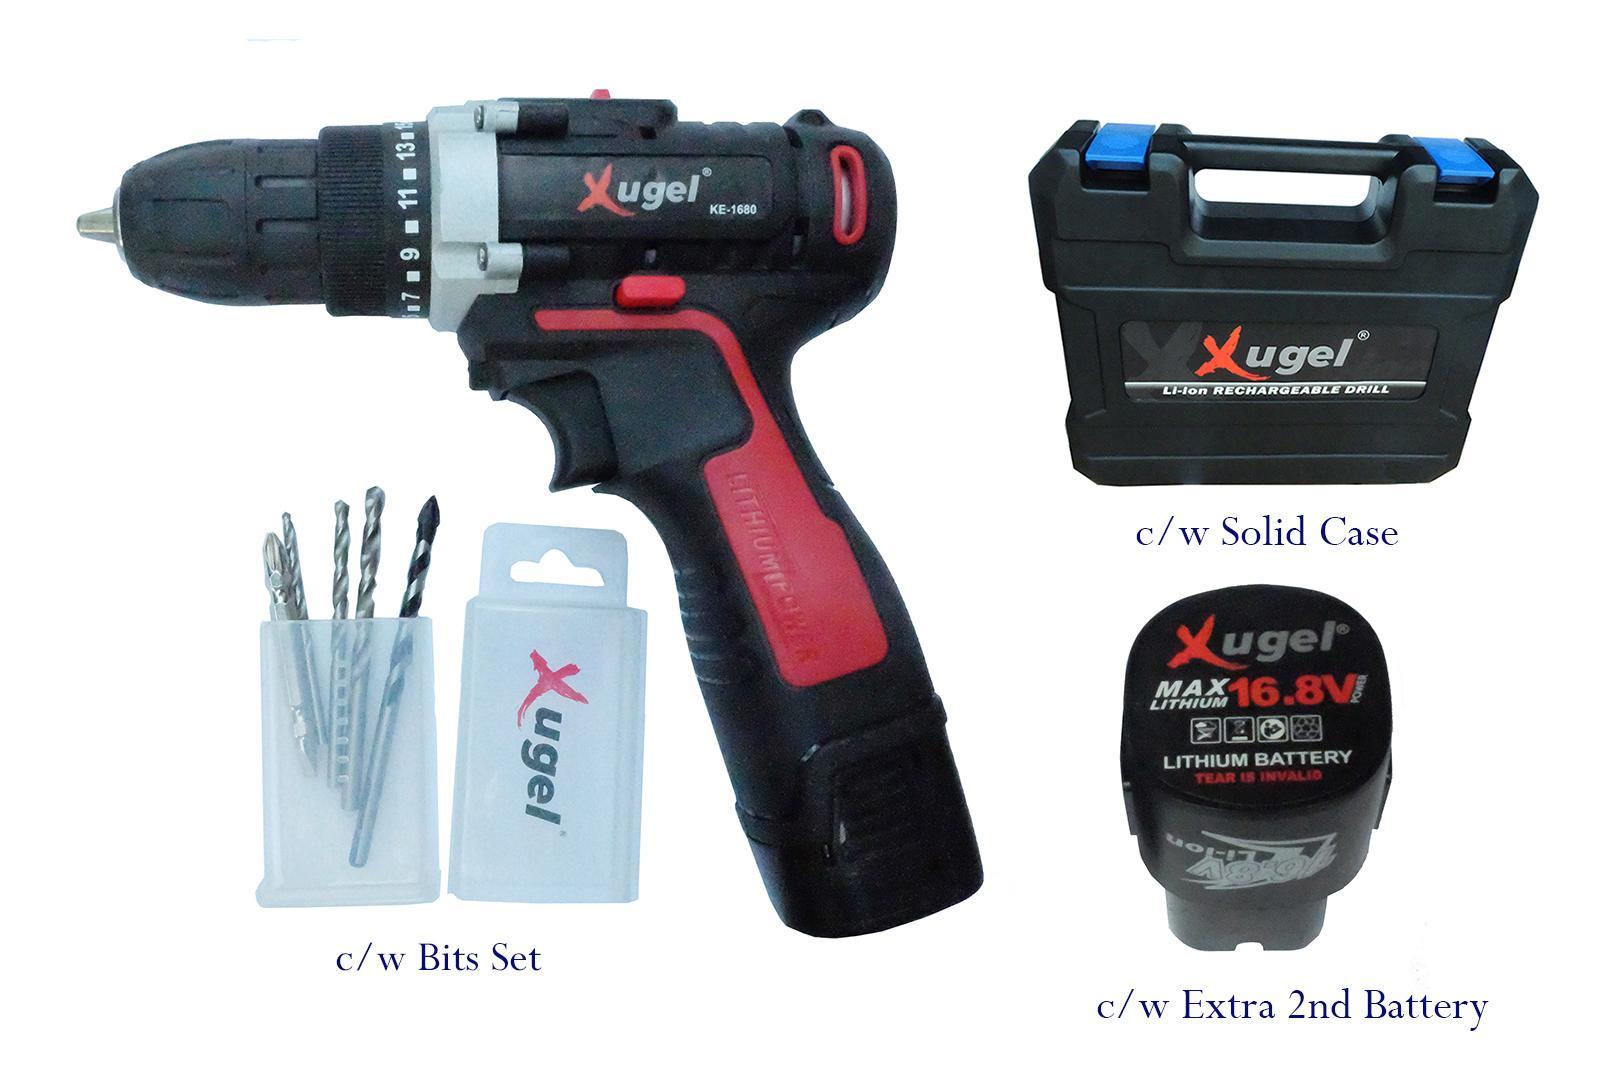 Xugel 16.8V Battery Cordless Drill with 2 Batteries and 5pcs Bits Set Model KE1680